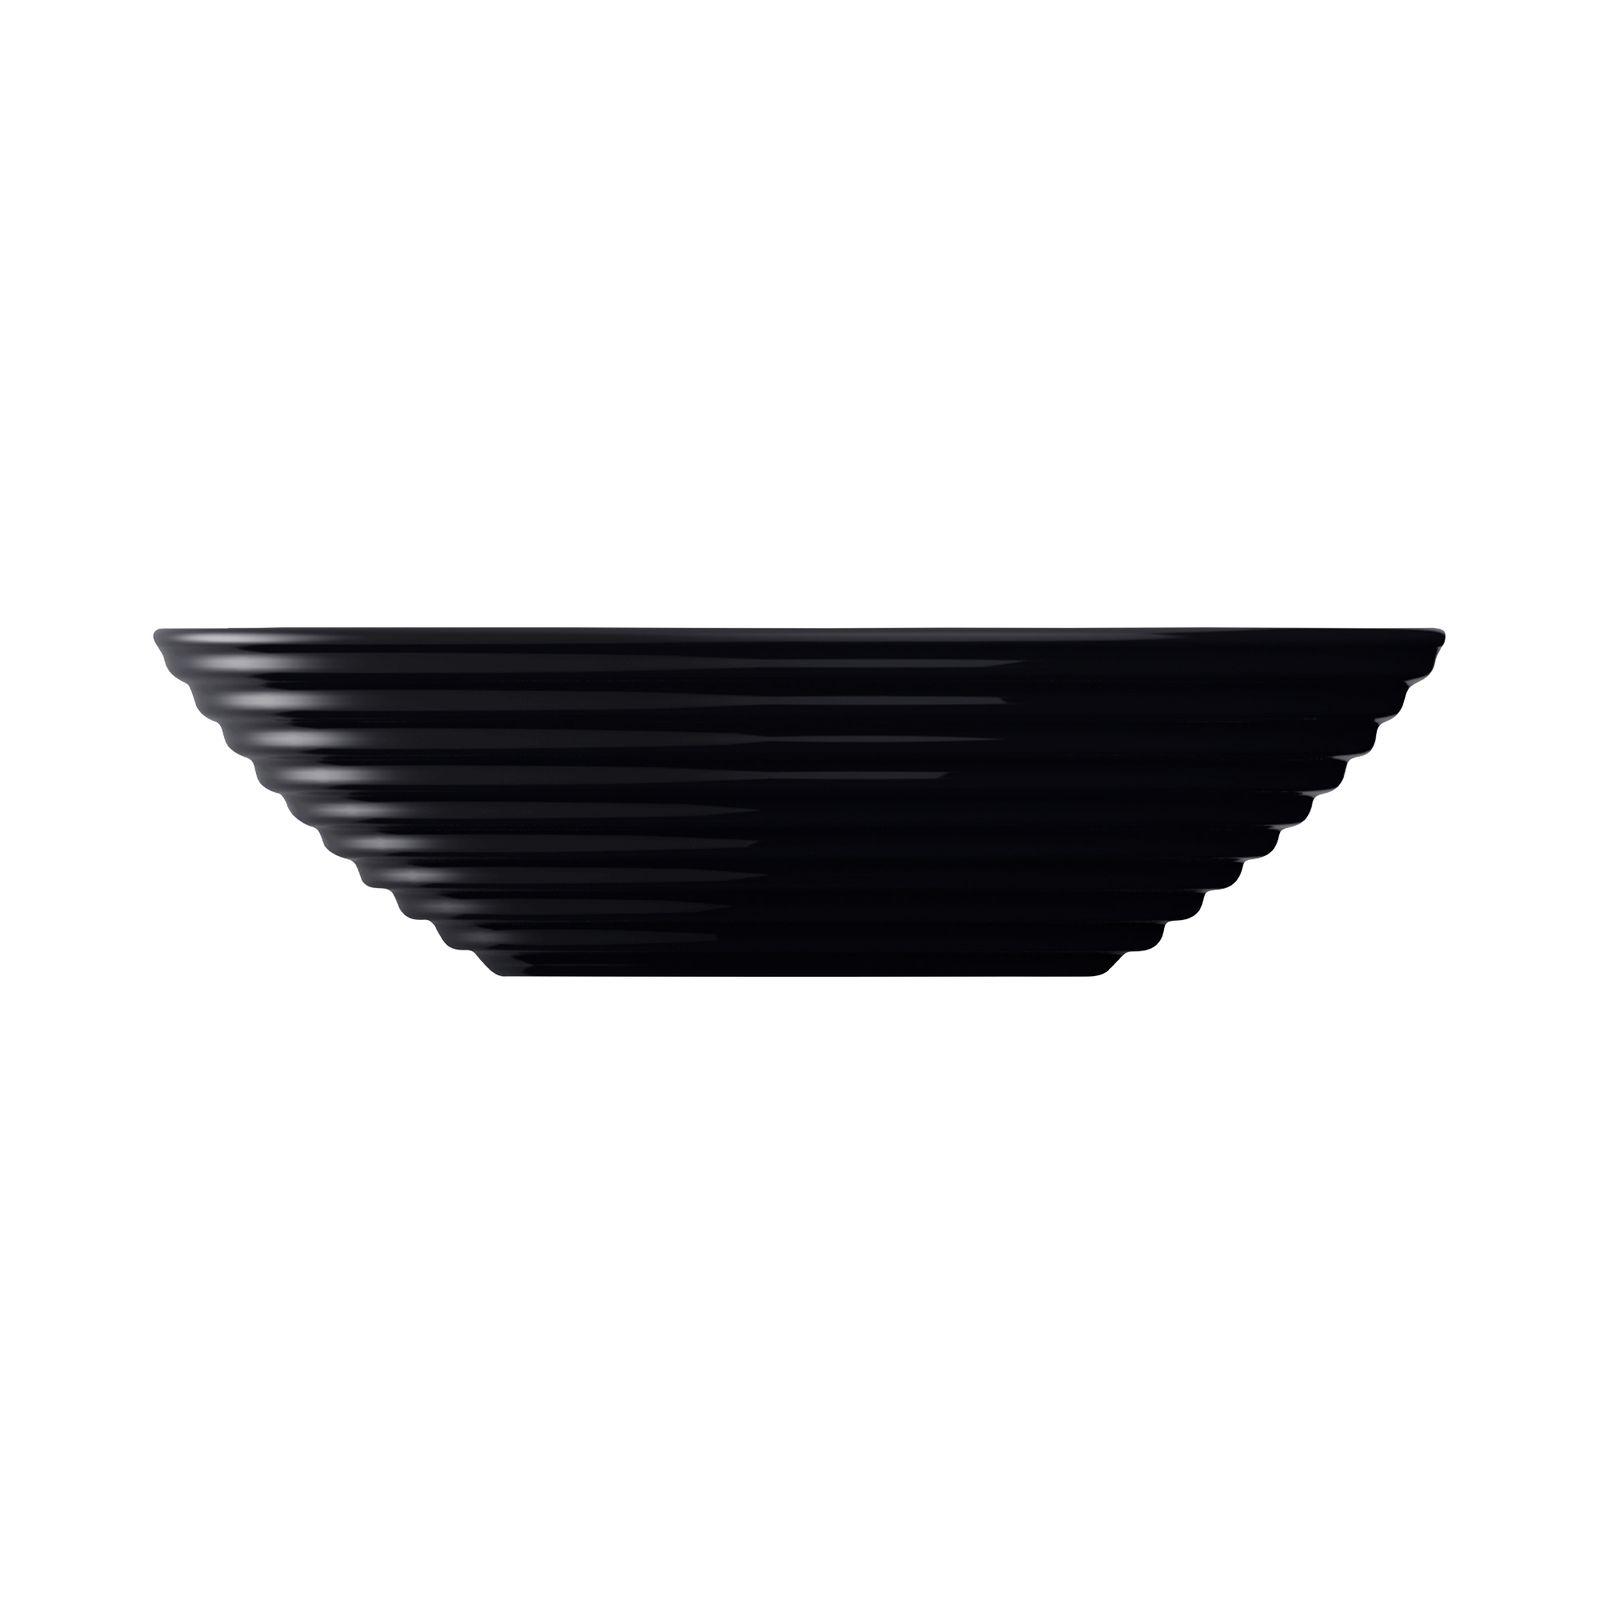 Salaterka / talerz głęboki Harena 20 cm czarny LUMINARC